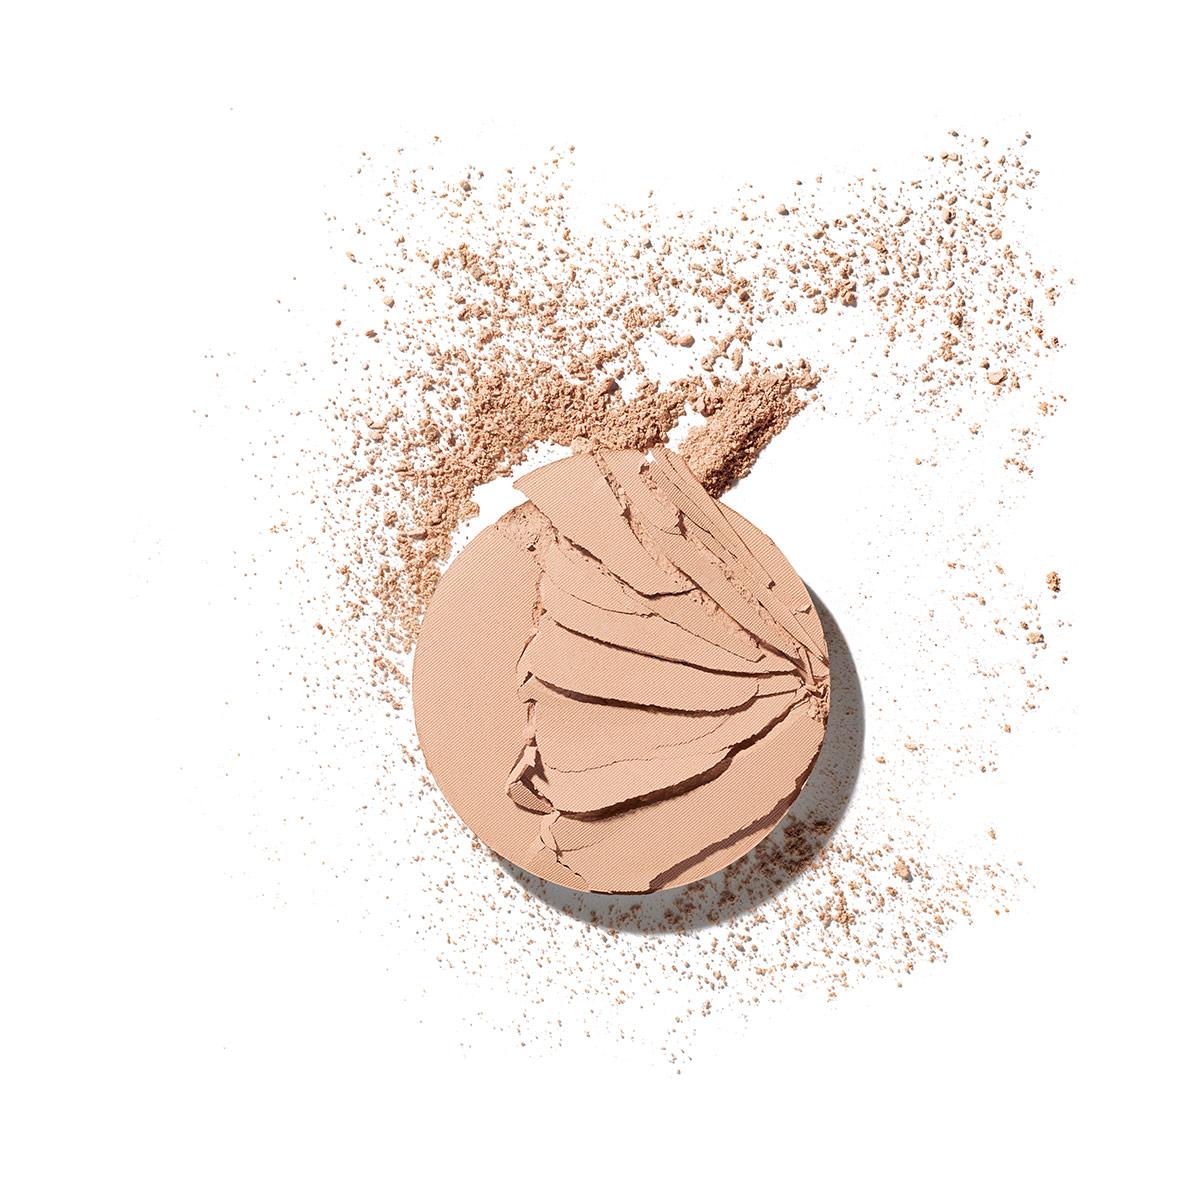 La Roche-Posay UVIDEA XL 每日高效隔離系列系列的UVIDEA輕柔透亮低敏防曬粉餅  產品圖片